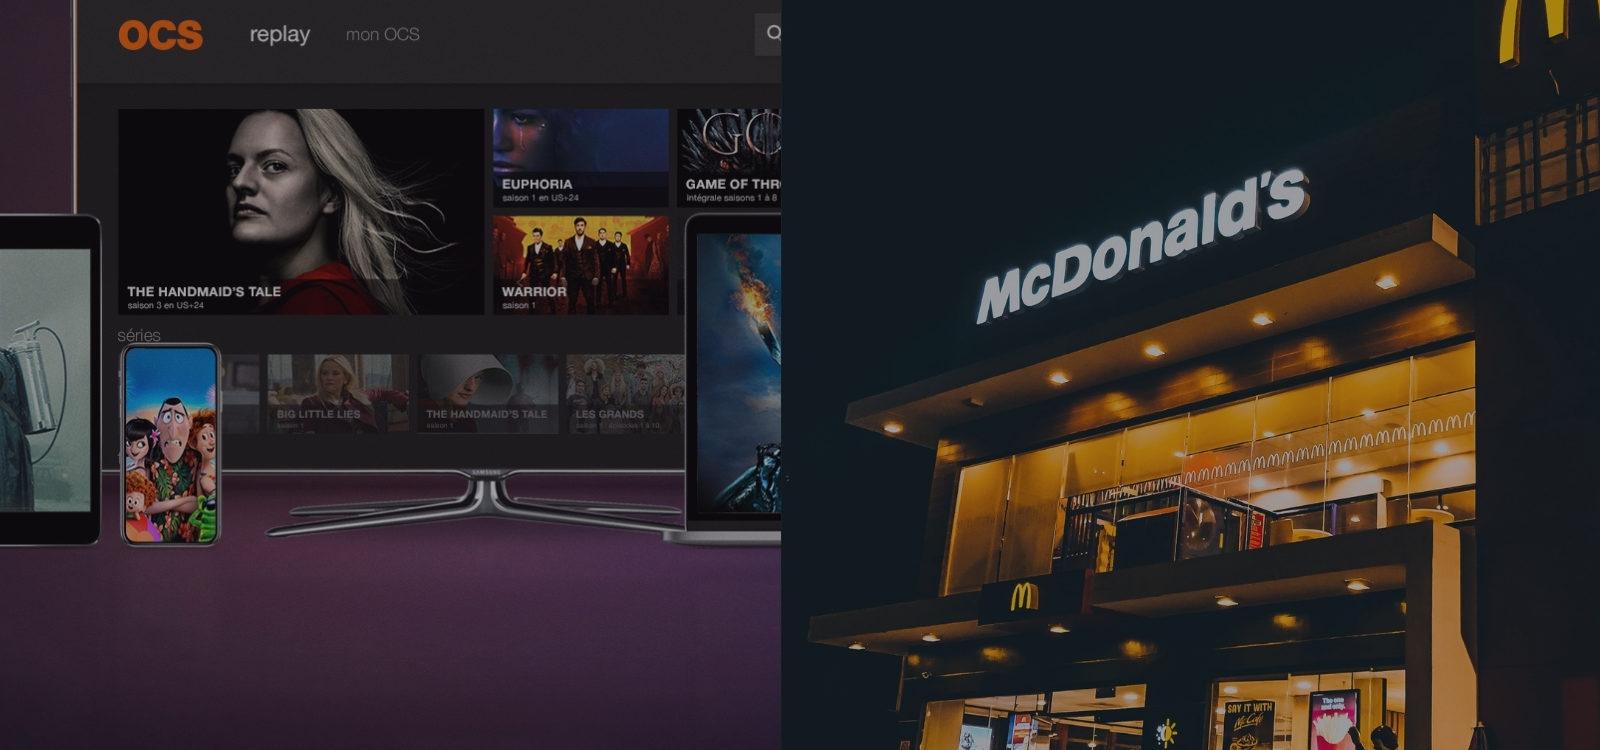 McDonald's et OCS : deux poids, deux mesures